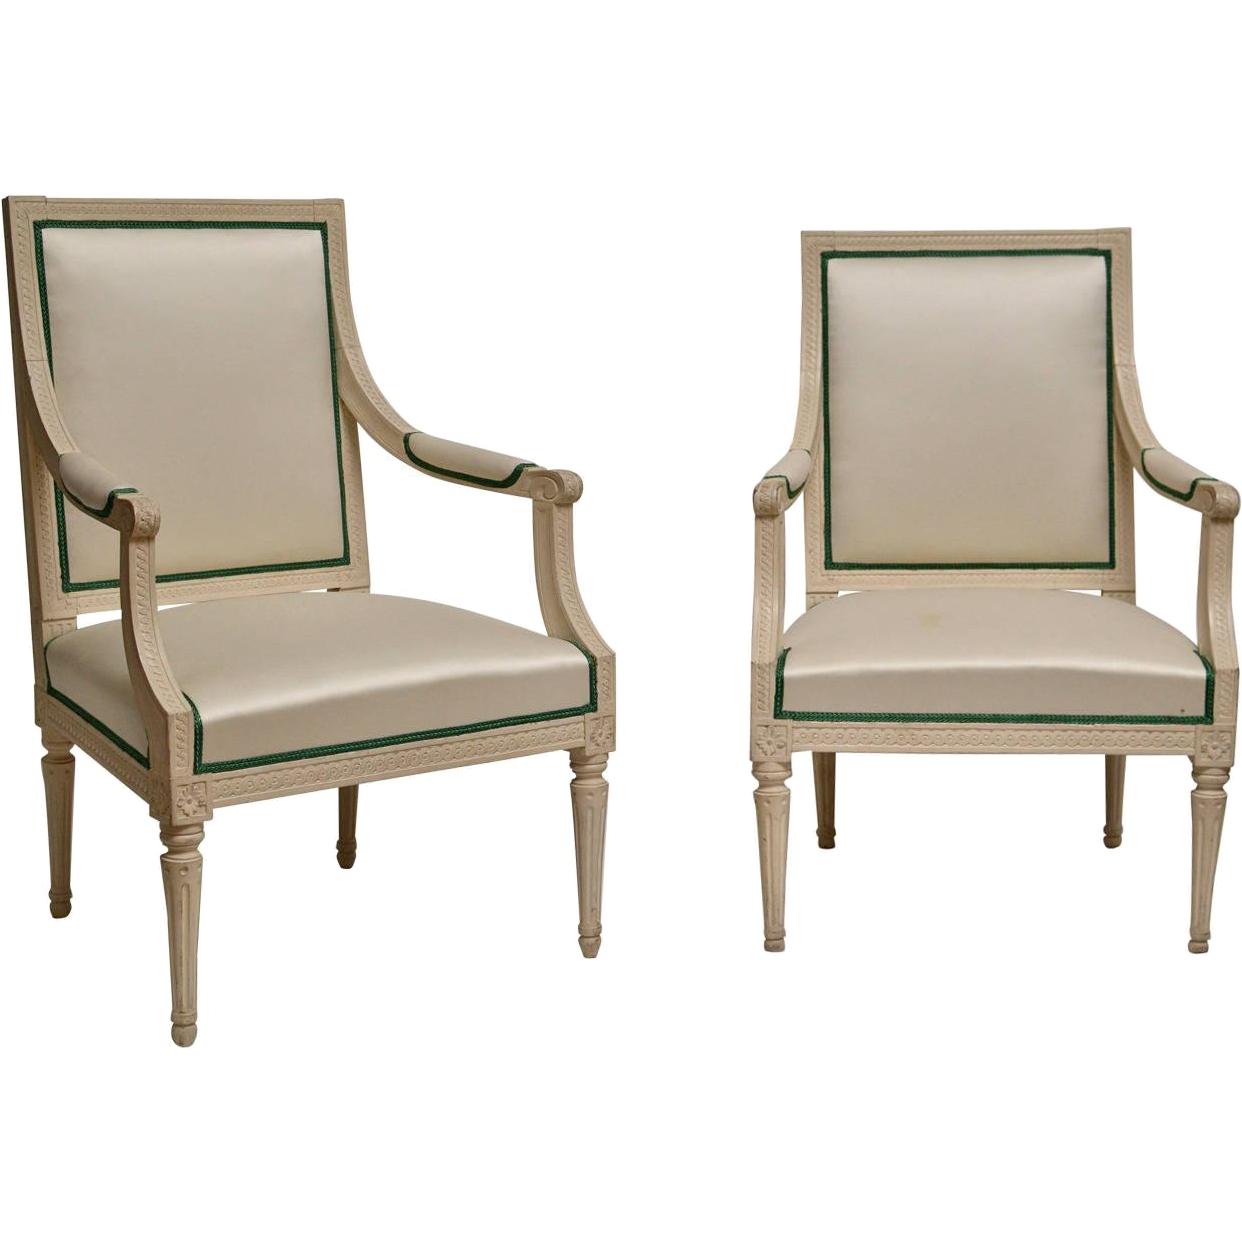 201509: Pair Of Crème Painted Gustavian Armchairs, Johan Lindgren